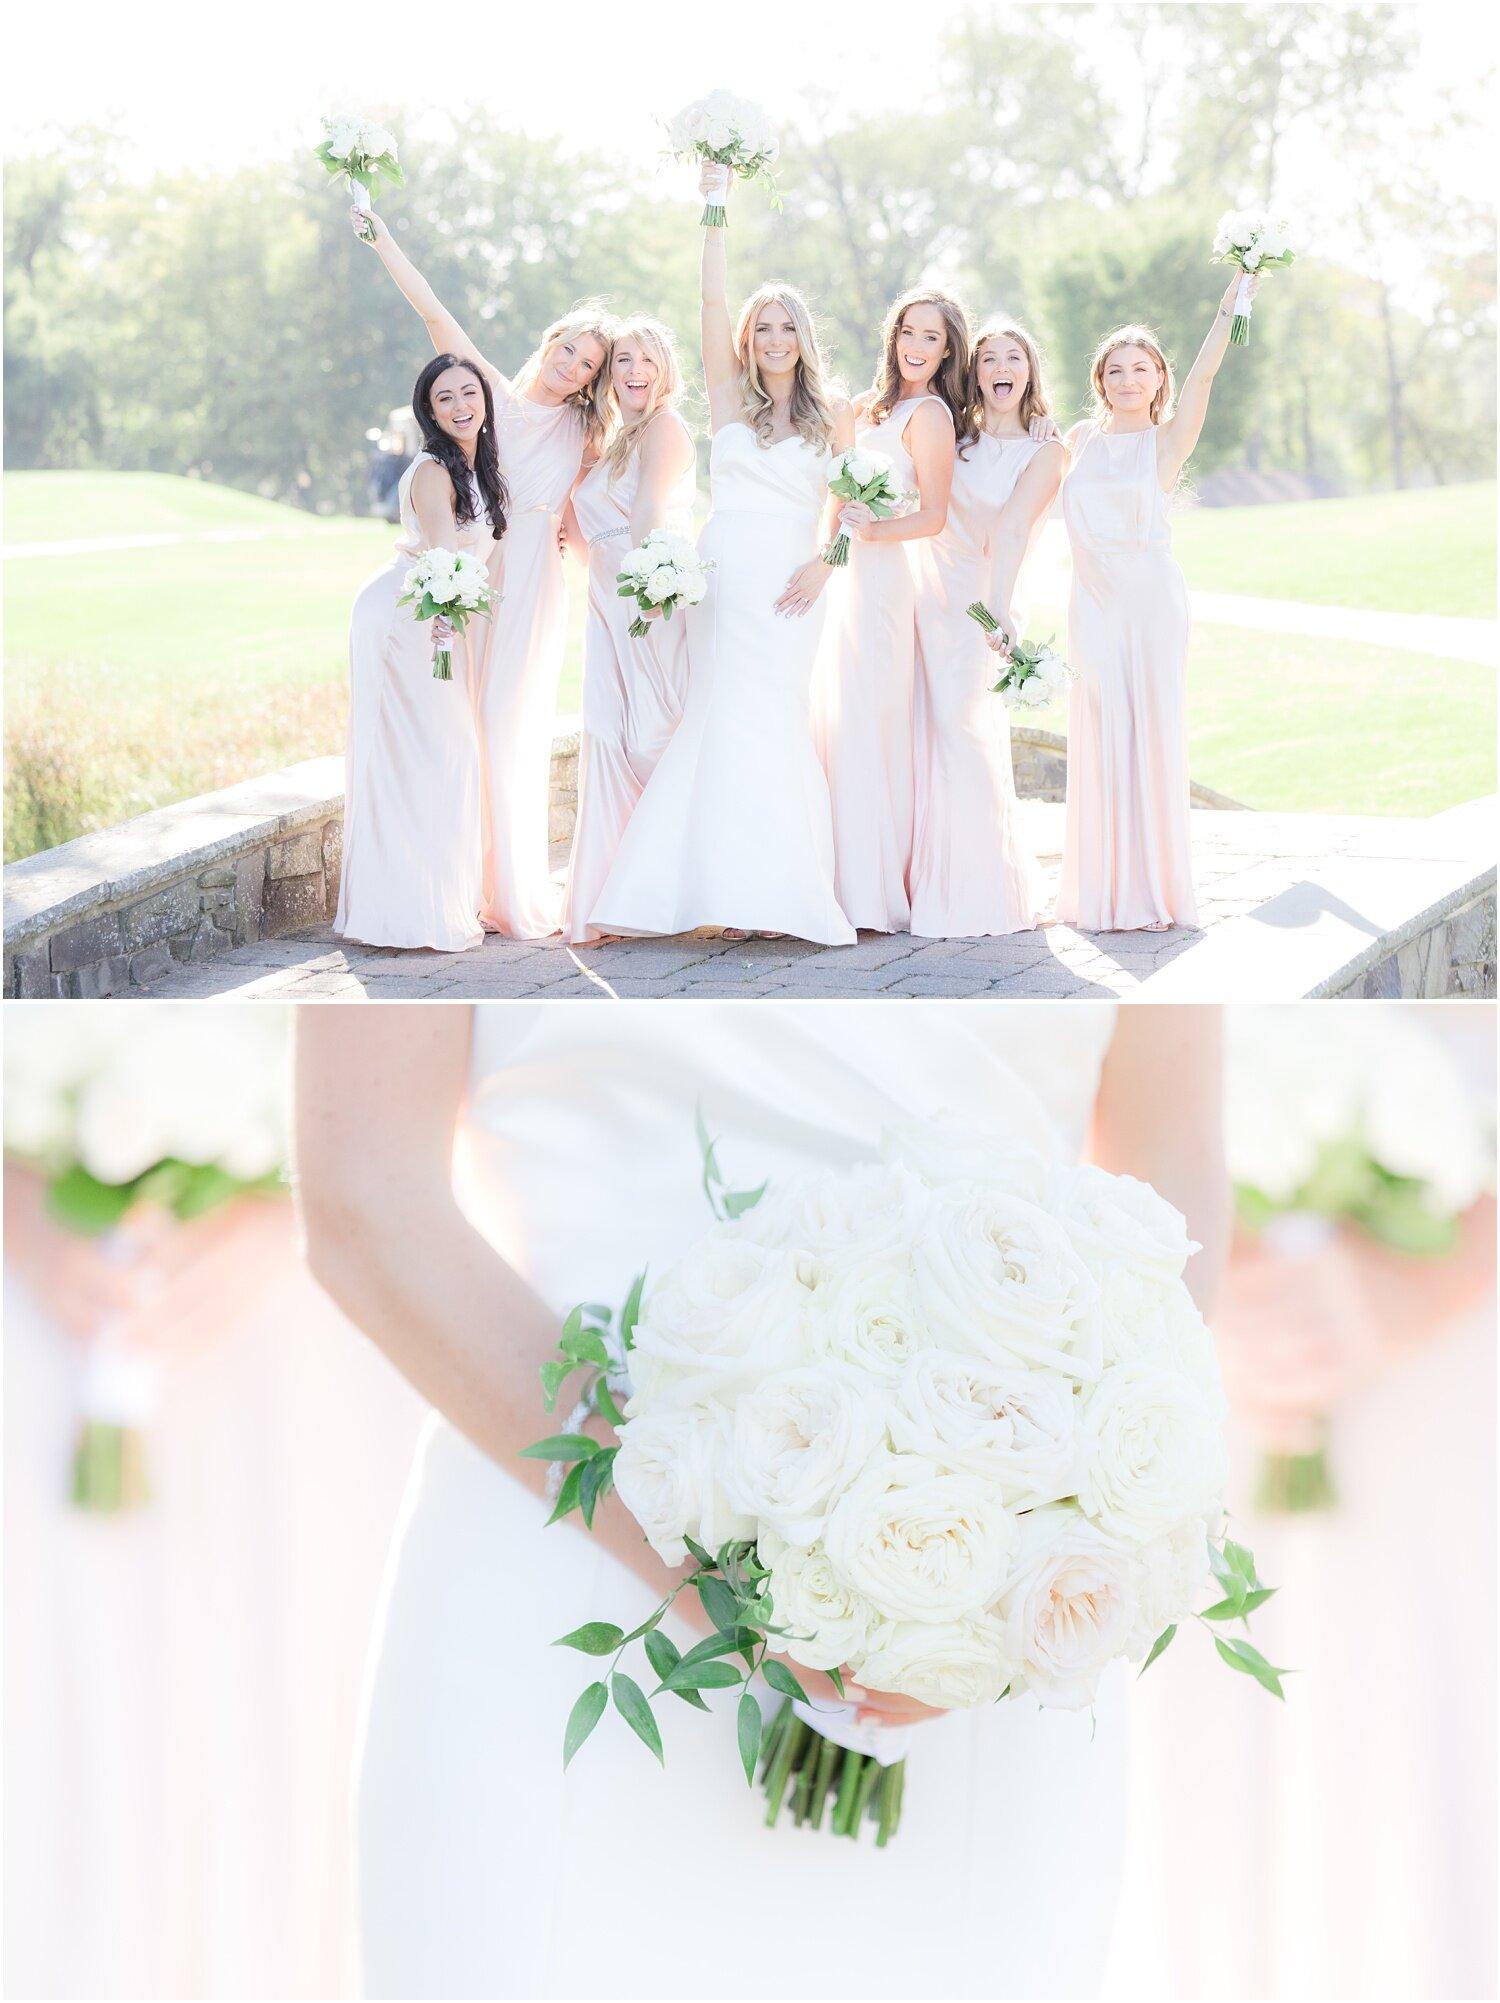 Fun bridesmaid photos at Spring Lake Golf Club wedding.